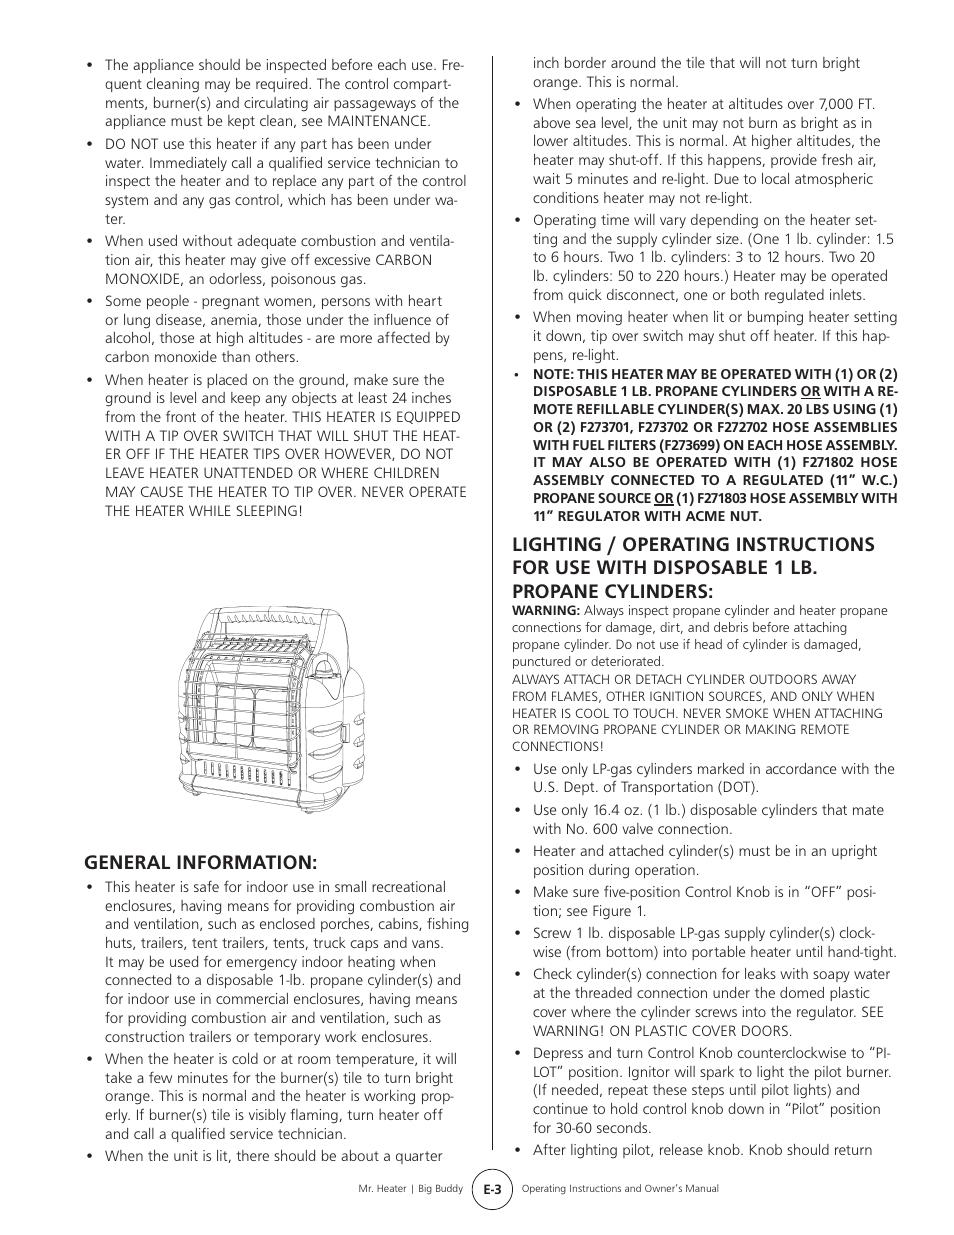 General Information Mr Heater Big Buddy Mh188 User